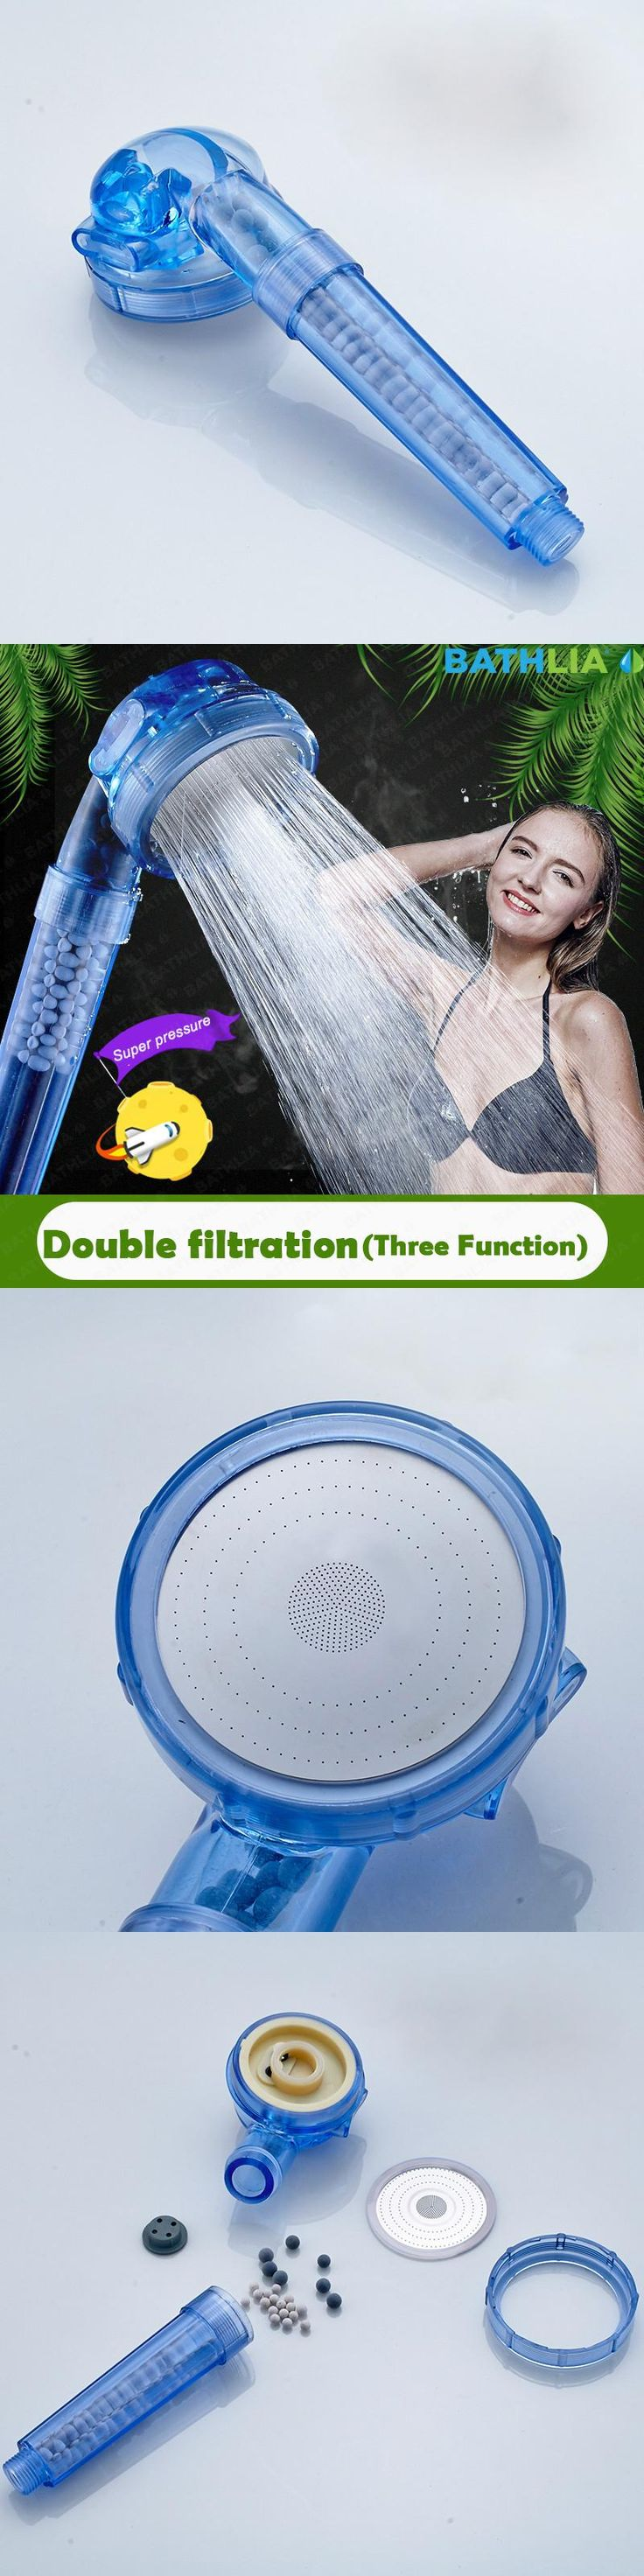 Pressure Boost Shower Nozzle ABS Plastic Water Saving Handheld Shower Head With Three Function Bathroom Showerhead